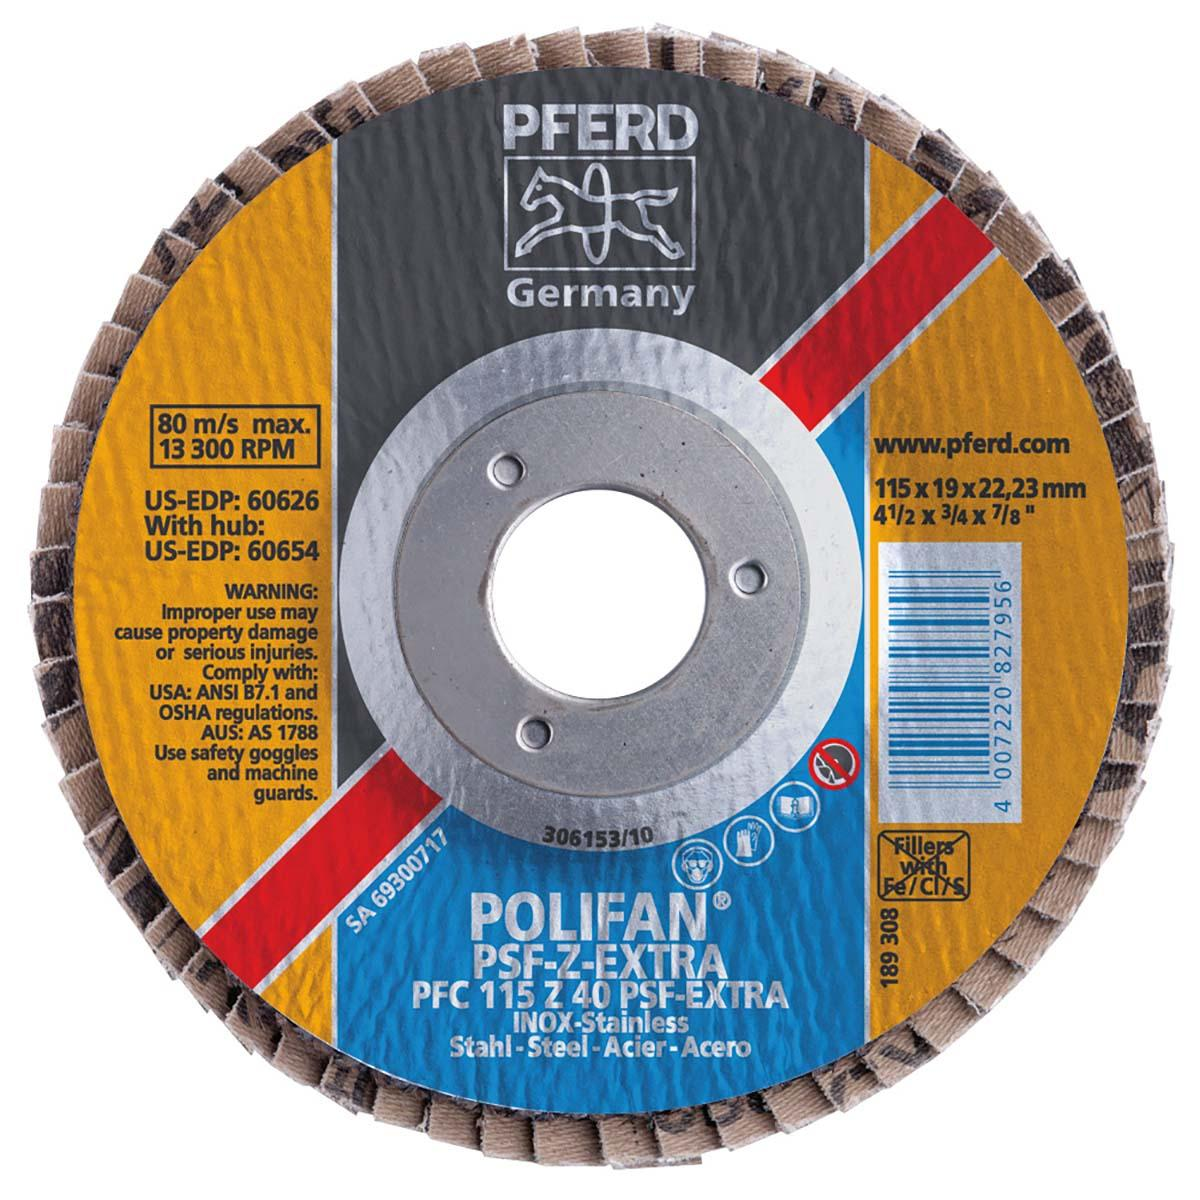 "4-1/2"" x 5/8-11 POLIFAN® Flap Disc - Flat PSF-EXTRA, Zirconia, 40 Grit"